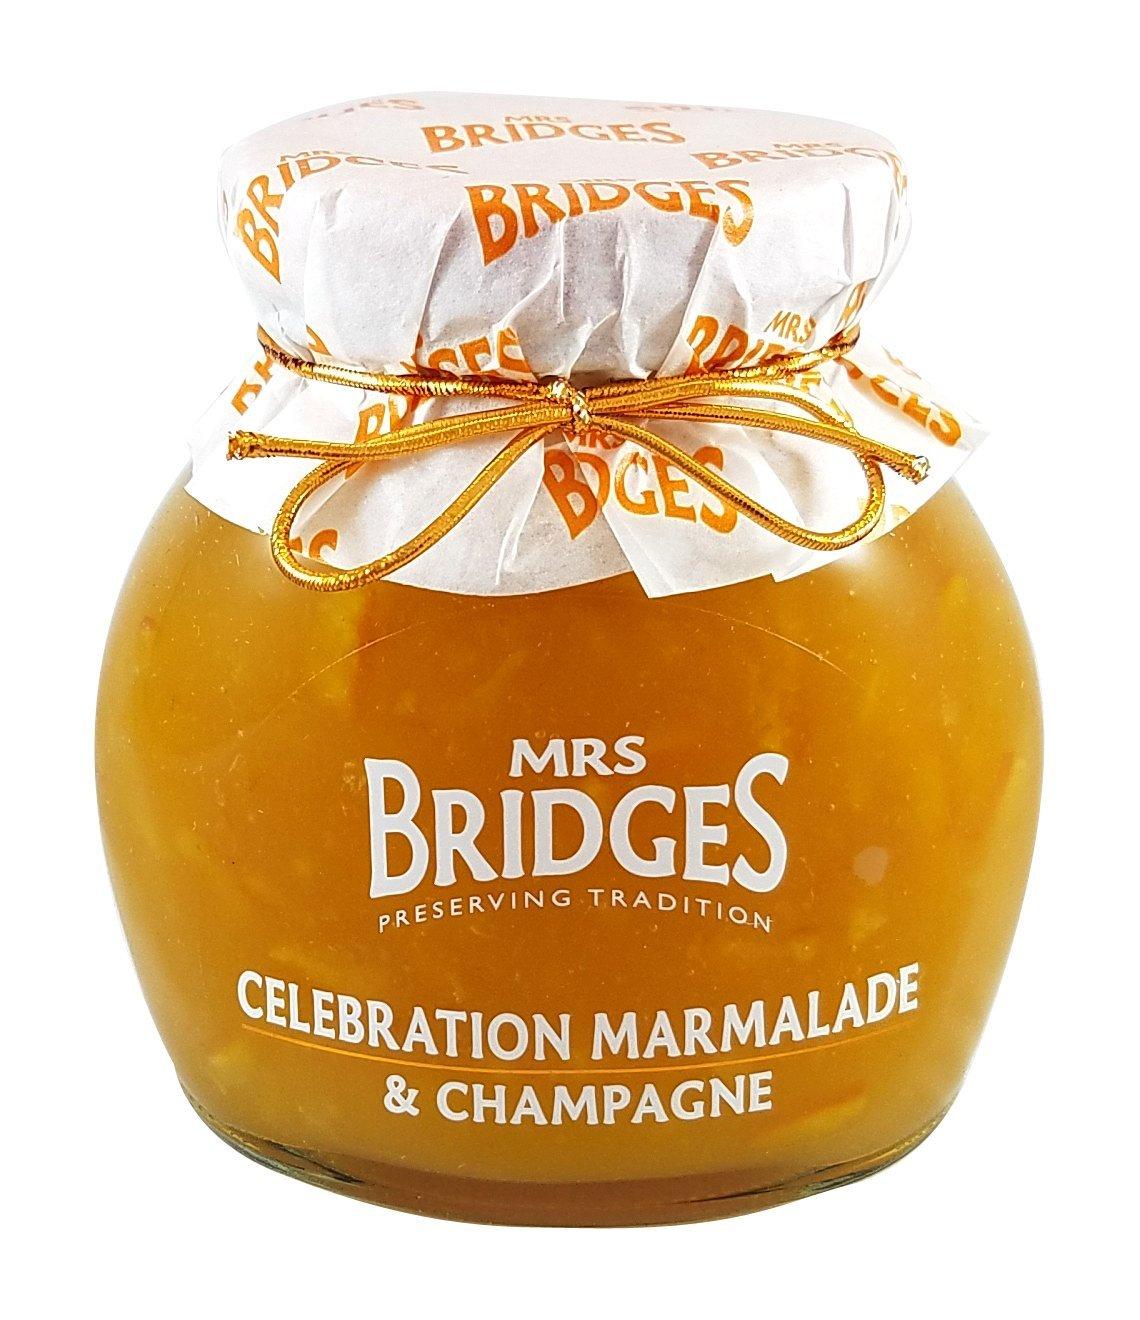 Mrs Bridges Celebration Marmalade with Champagne, 12 Ounce